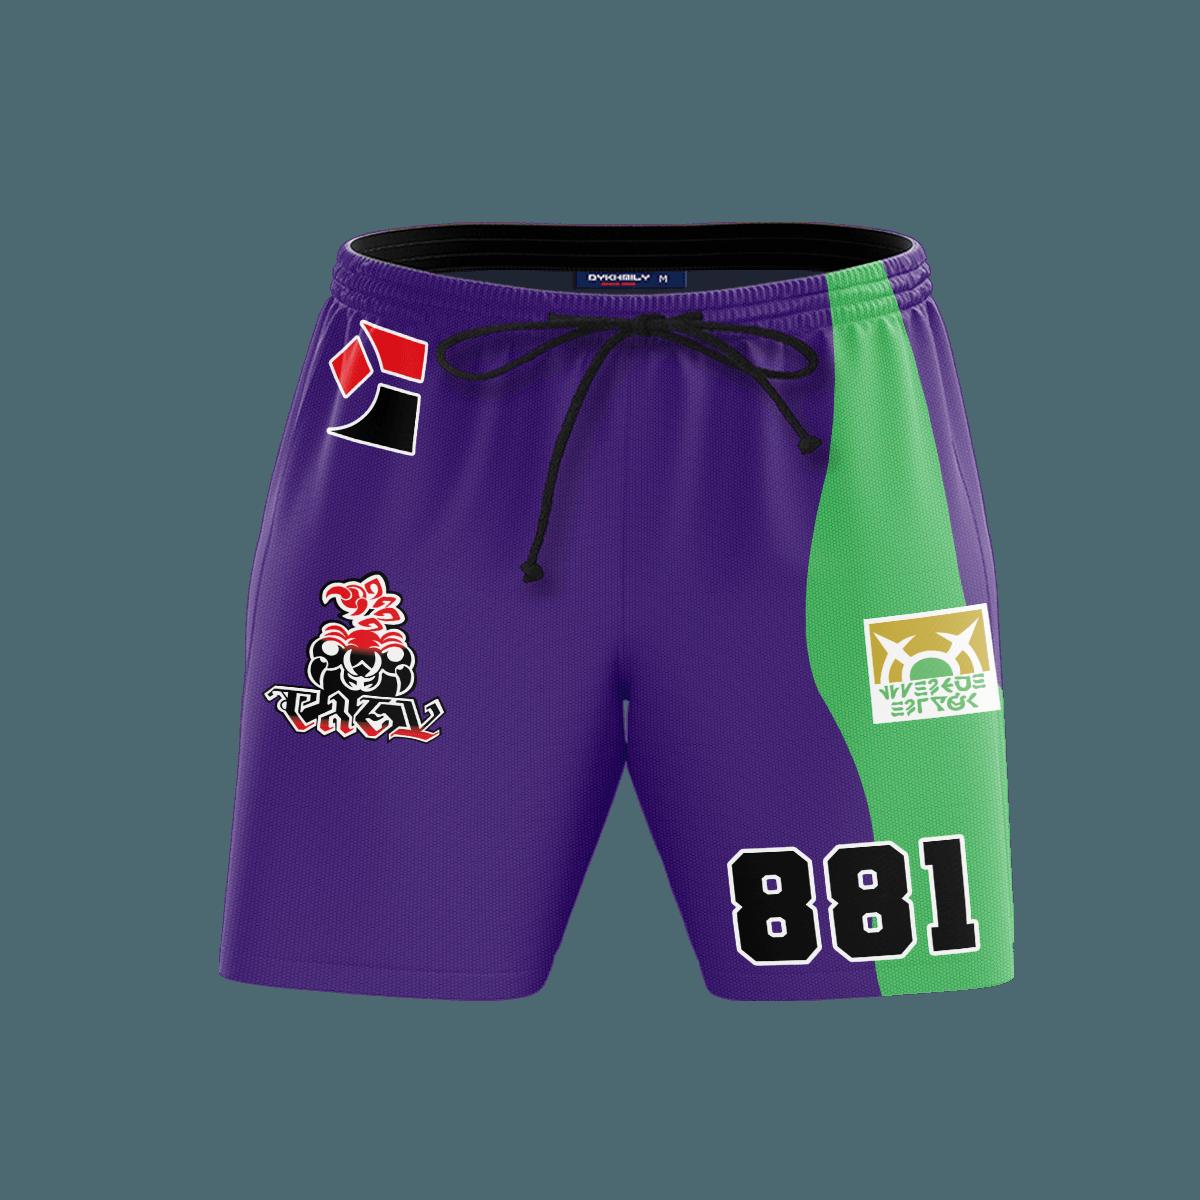 Pokemon Poison Uniform Beach Shorts FDM3107 S Official Anime Swimsuit Merch